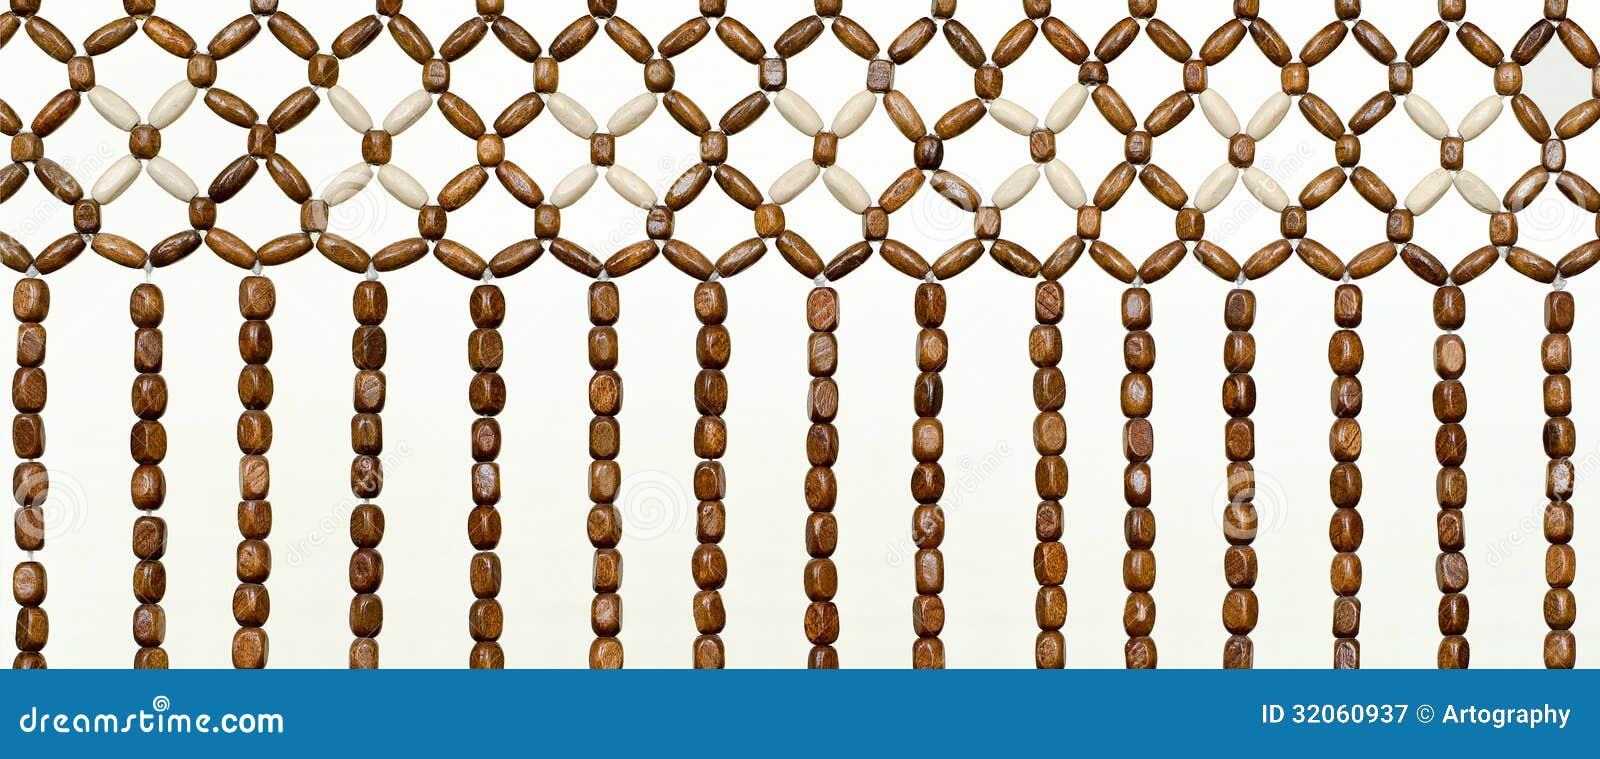 Beaded Curtain Wood Bead Closeup Royalty Free Stock Photography